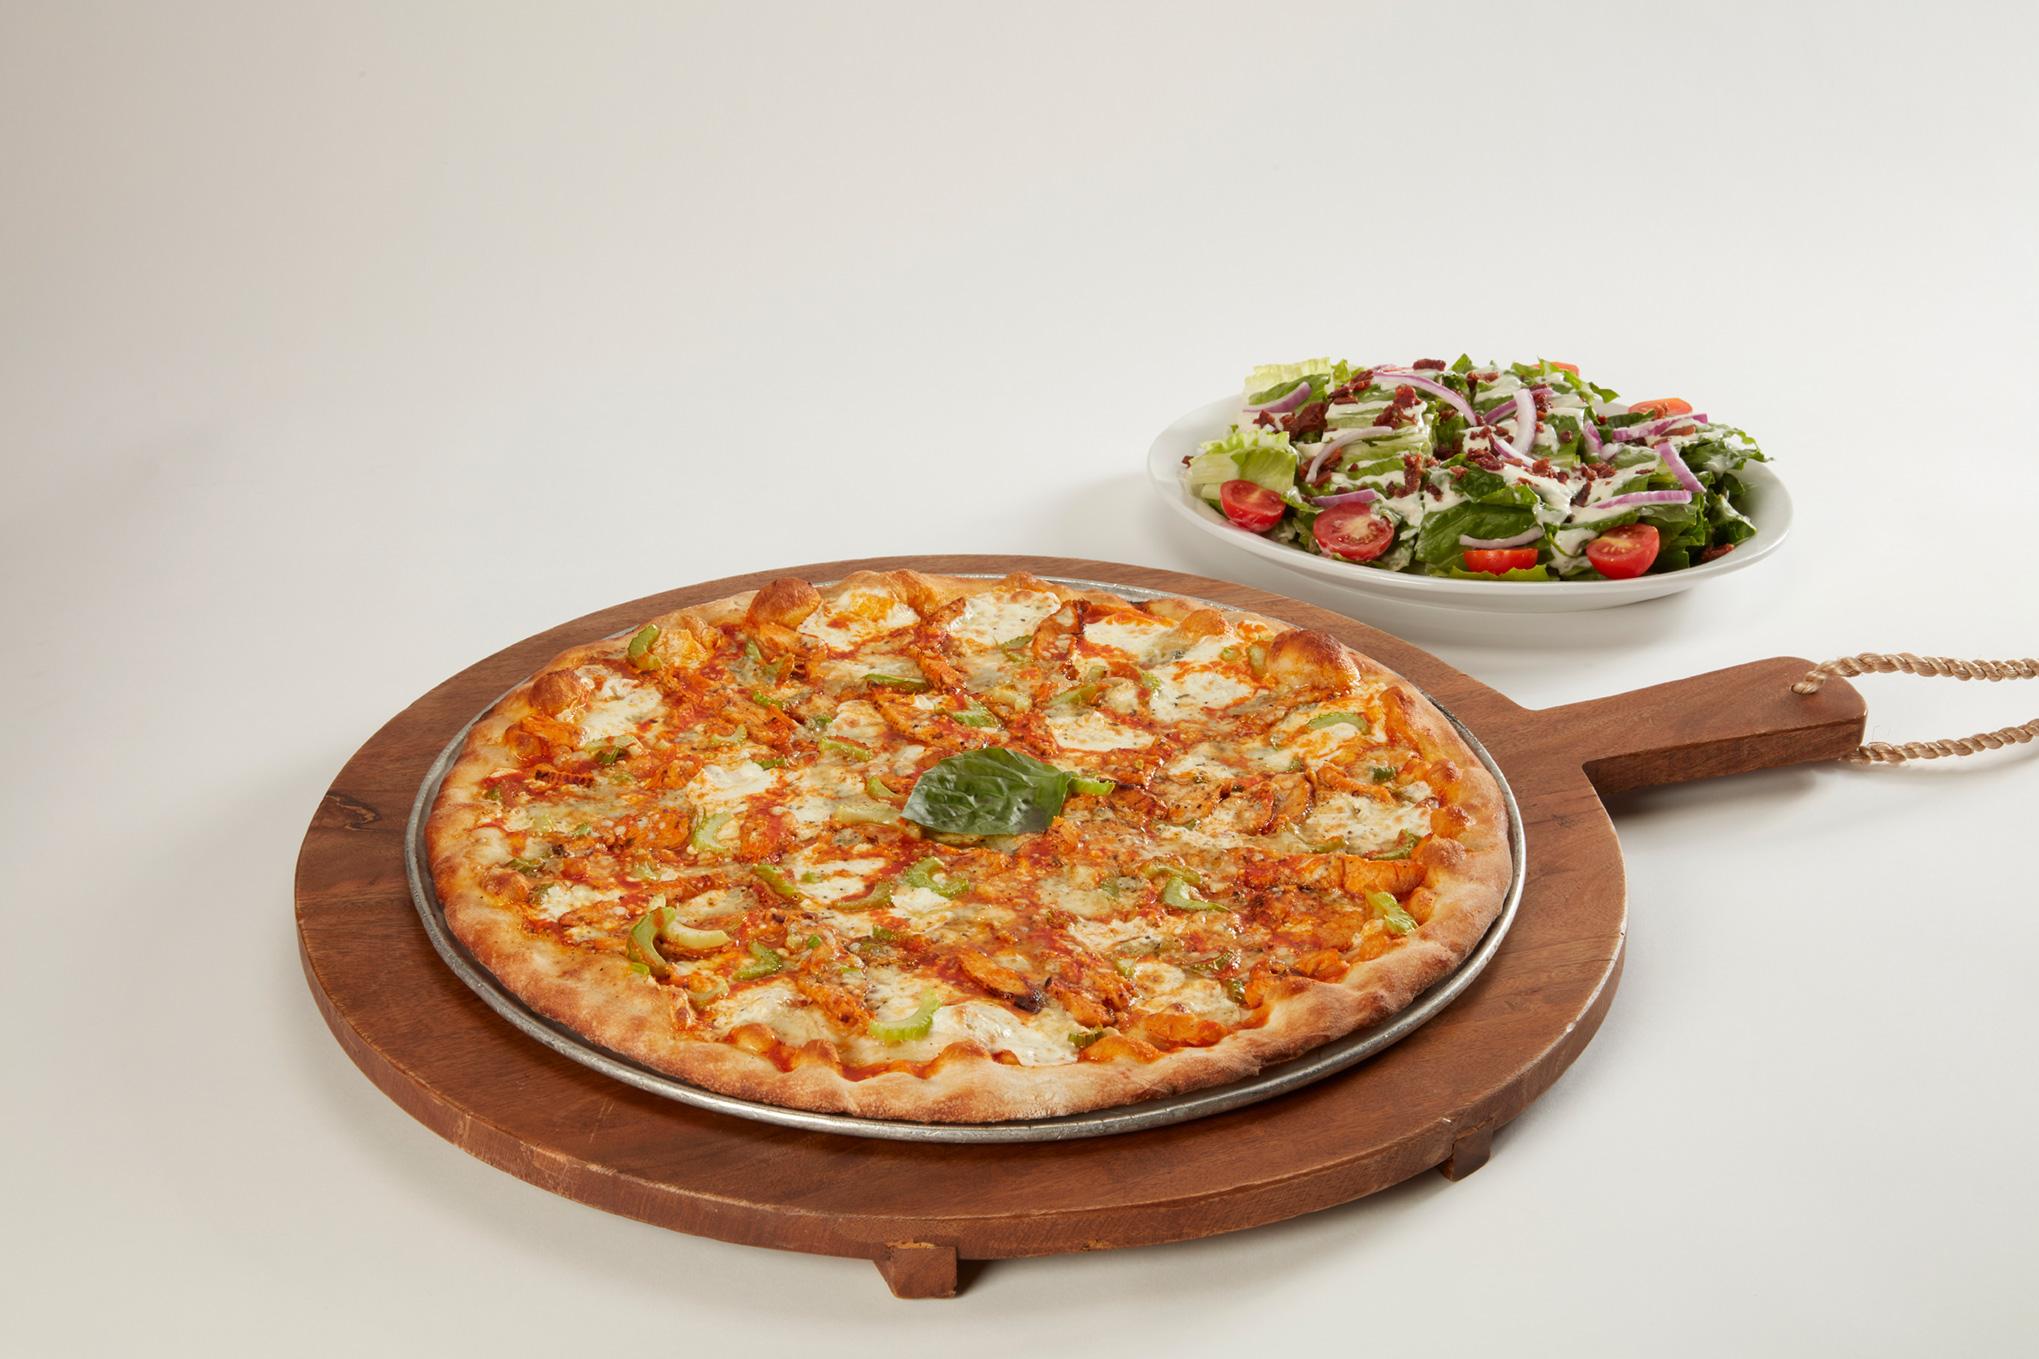 Grimaldi's Pizzeria Summer Selections